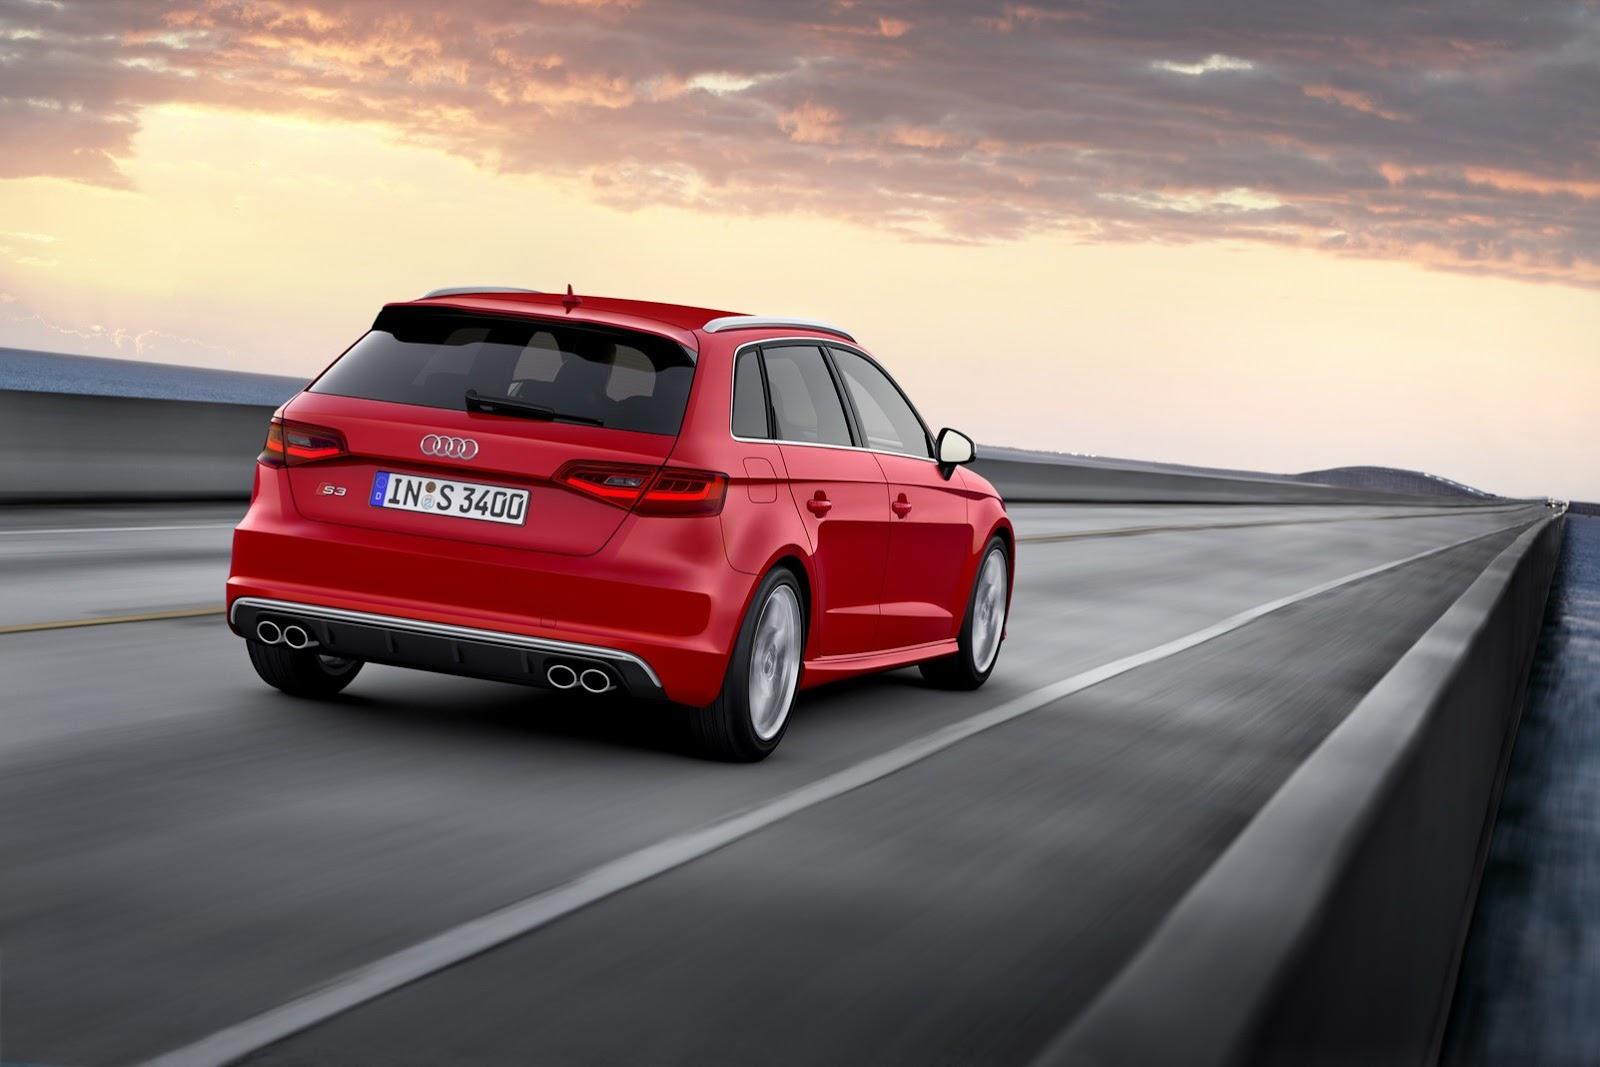 Audi-S3-Sportback-12%5B2%5D.jpg